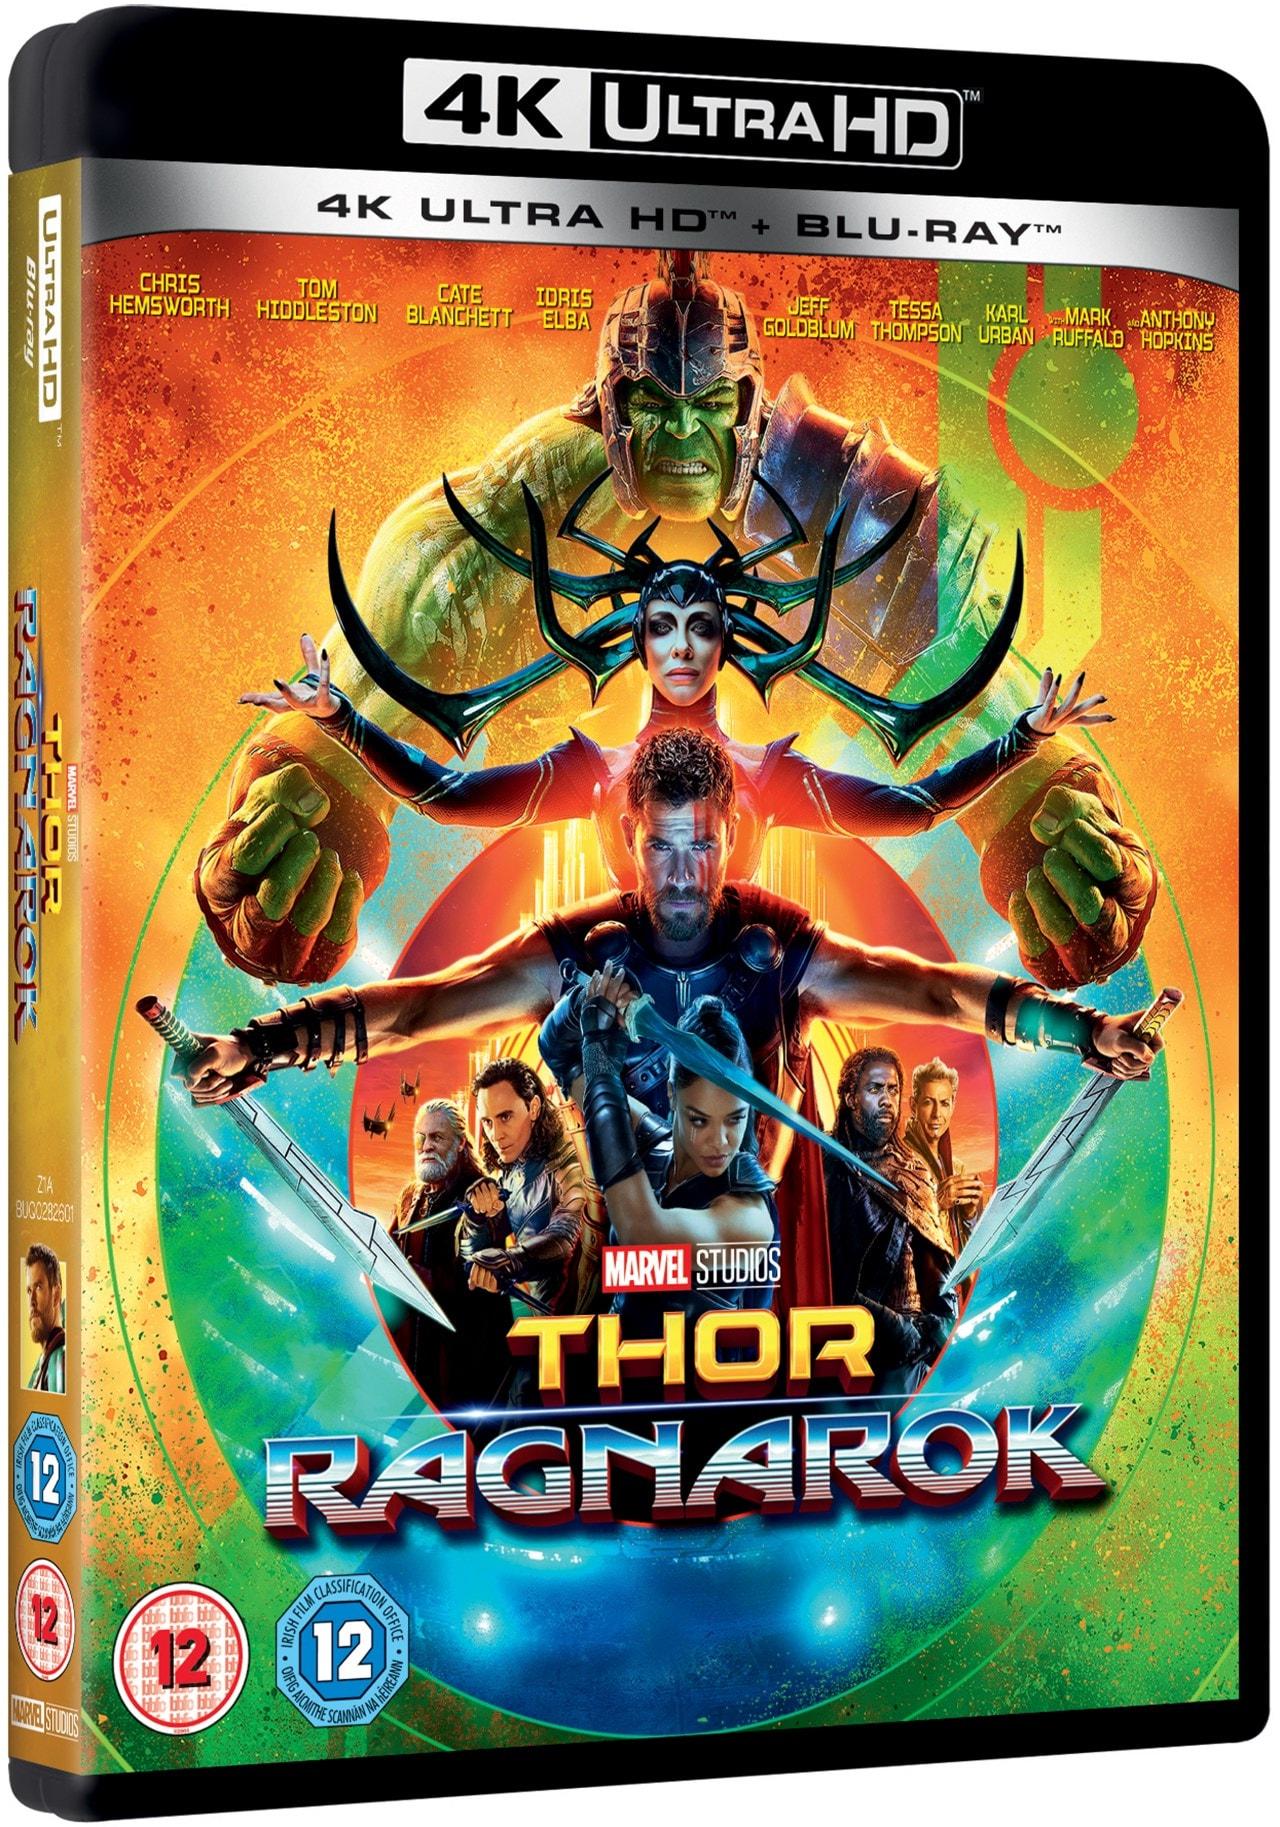 Thor: Ragnarok - 4